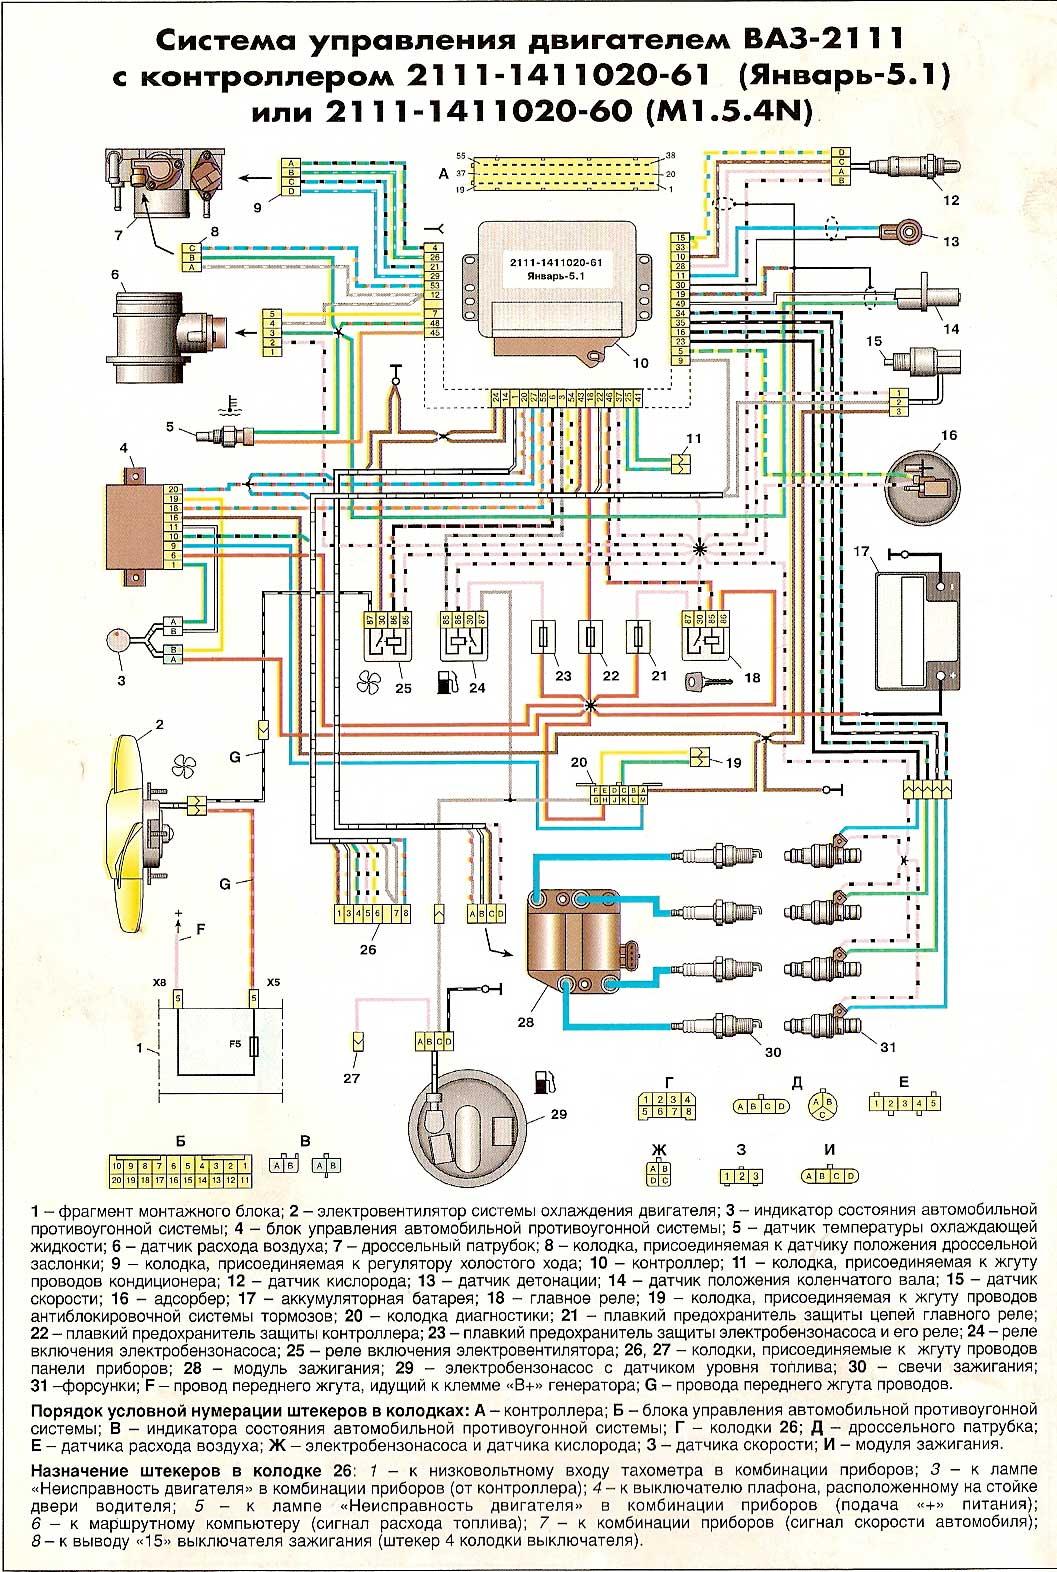 Схема электропроводки бензонасоса на ВАЗ 21115.